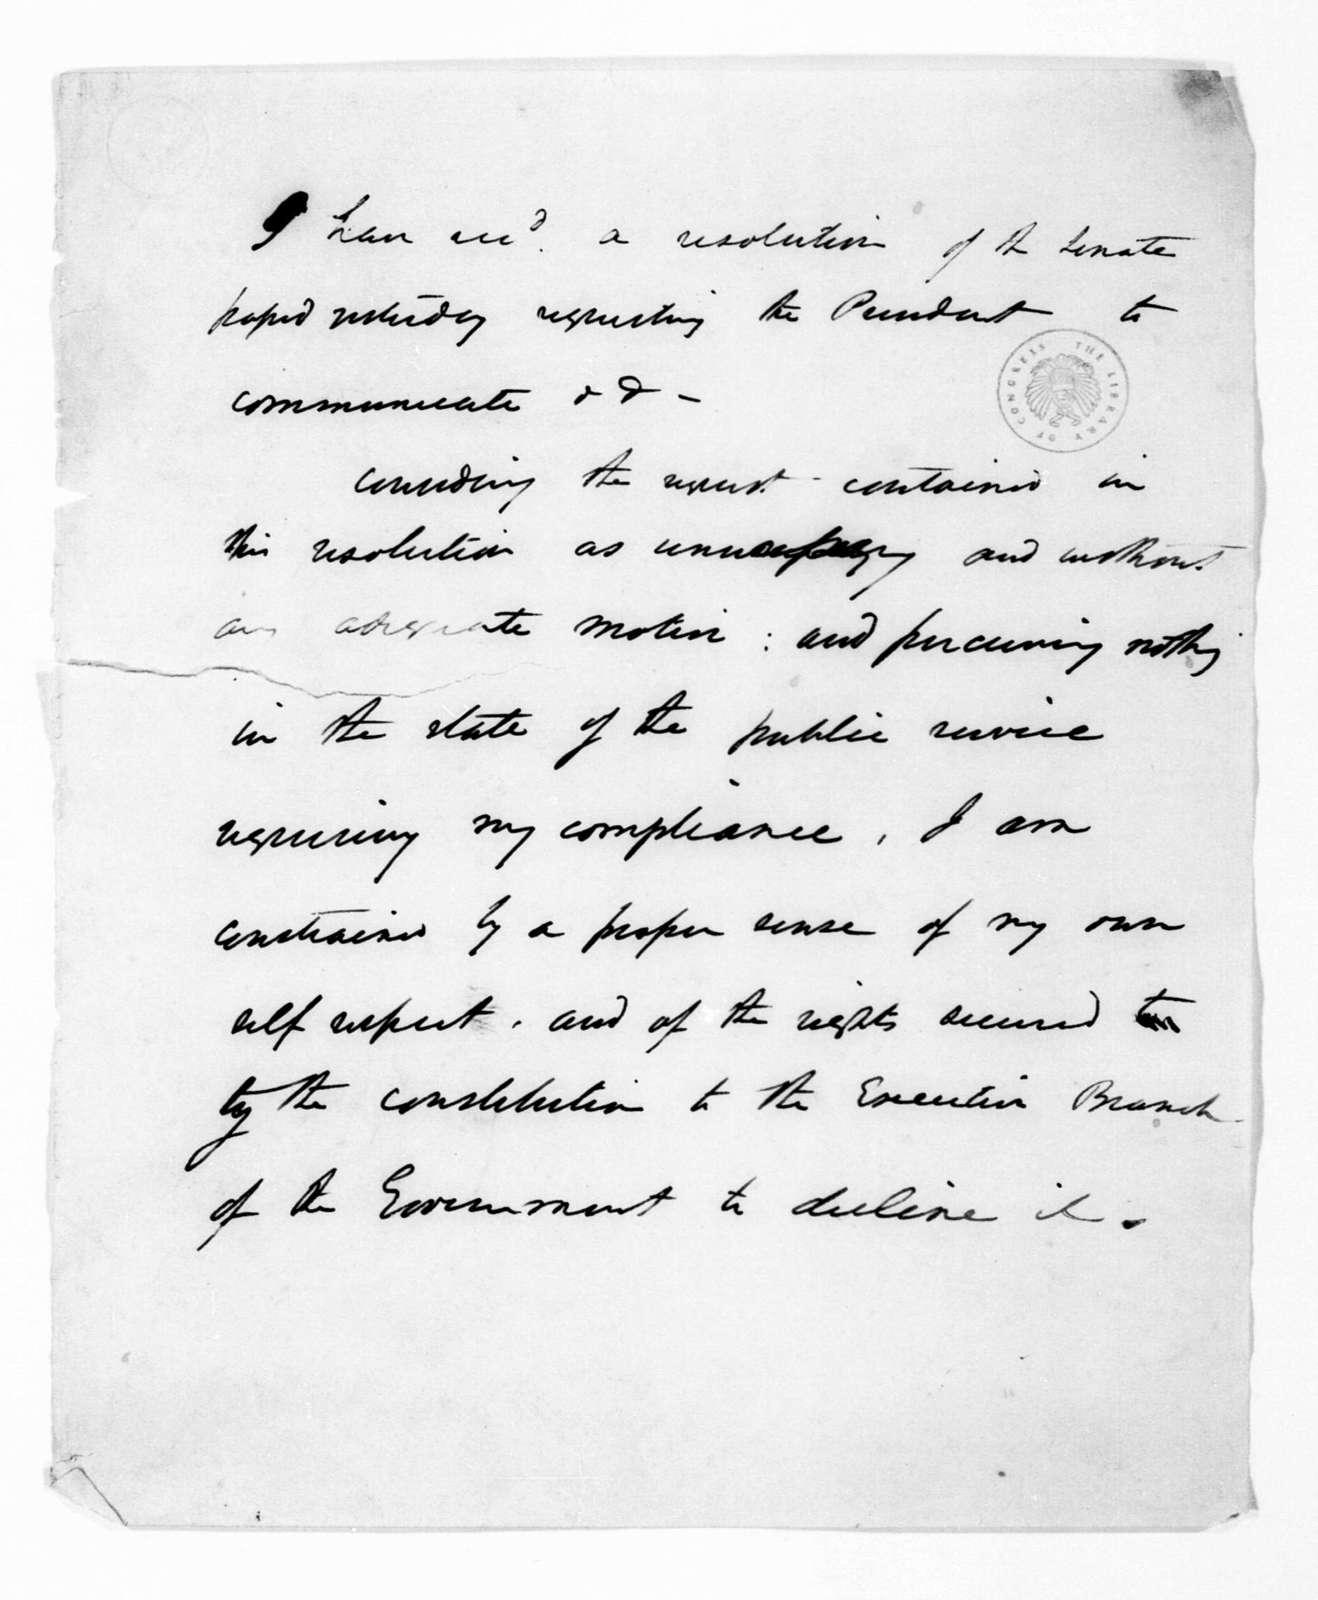 Andrew Jackson to U. S. Senate, December 12, 1833